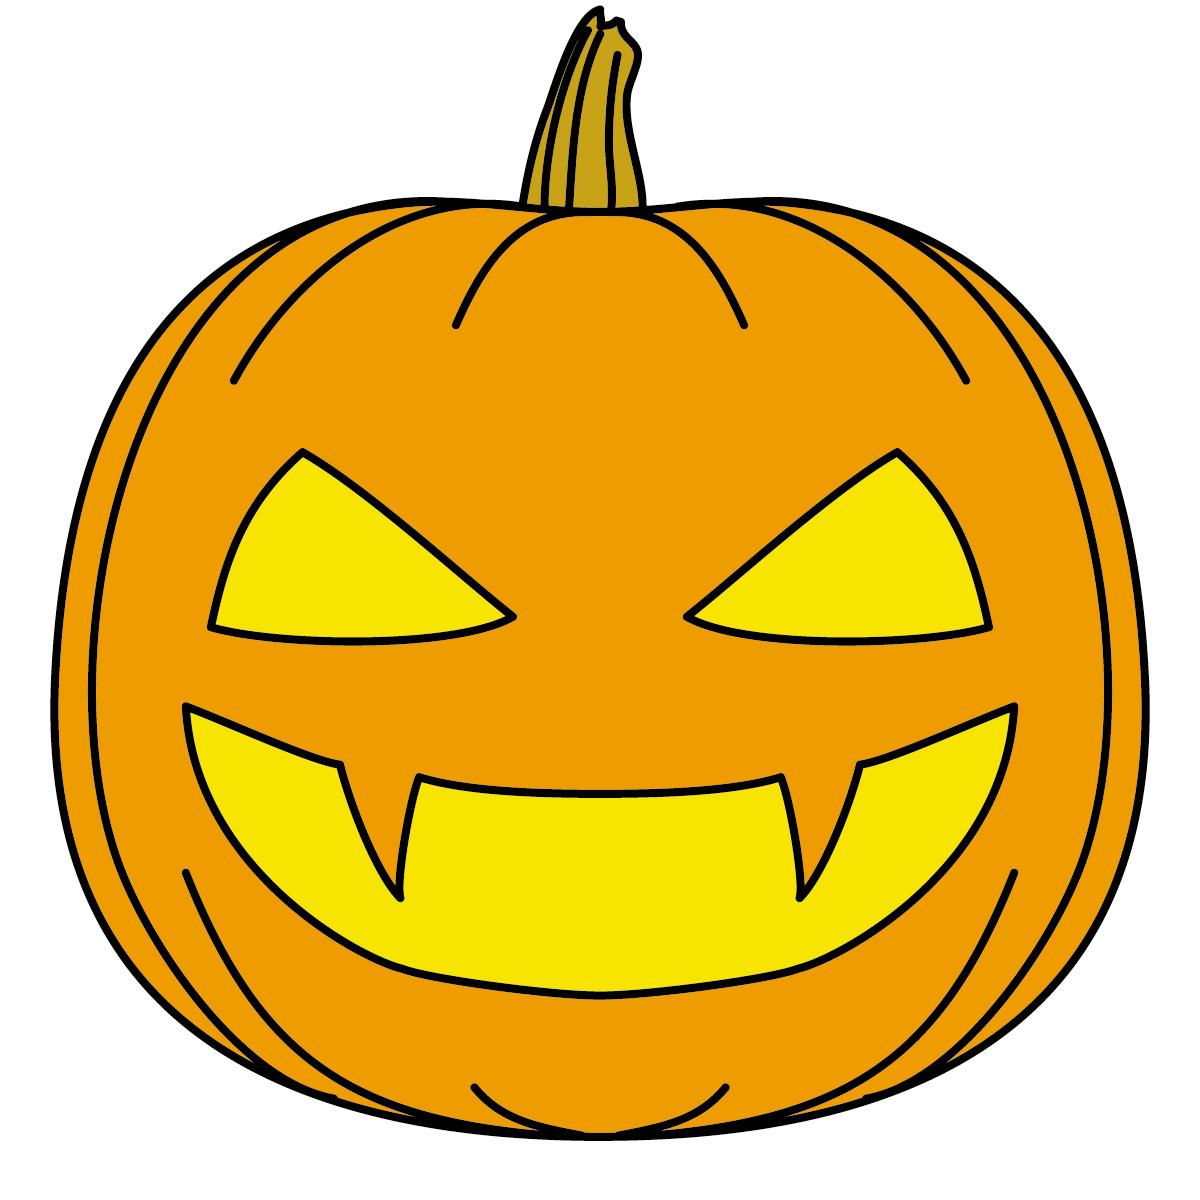 hight resolution of cream colored pumpkin clipart